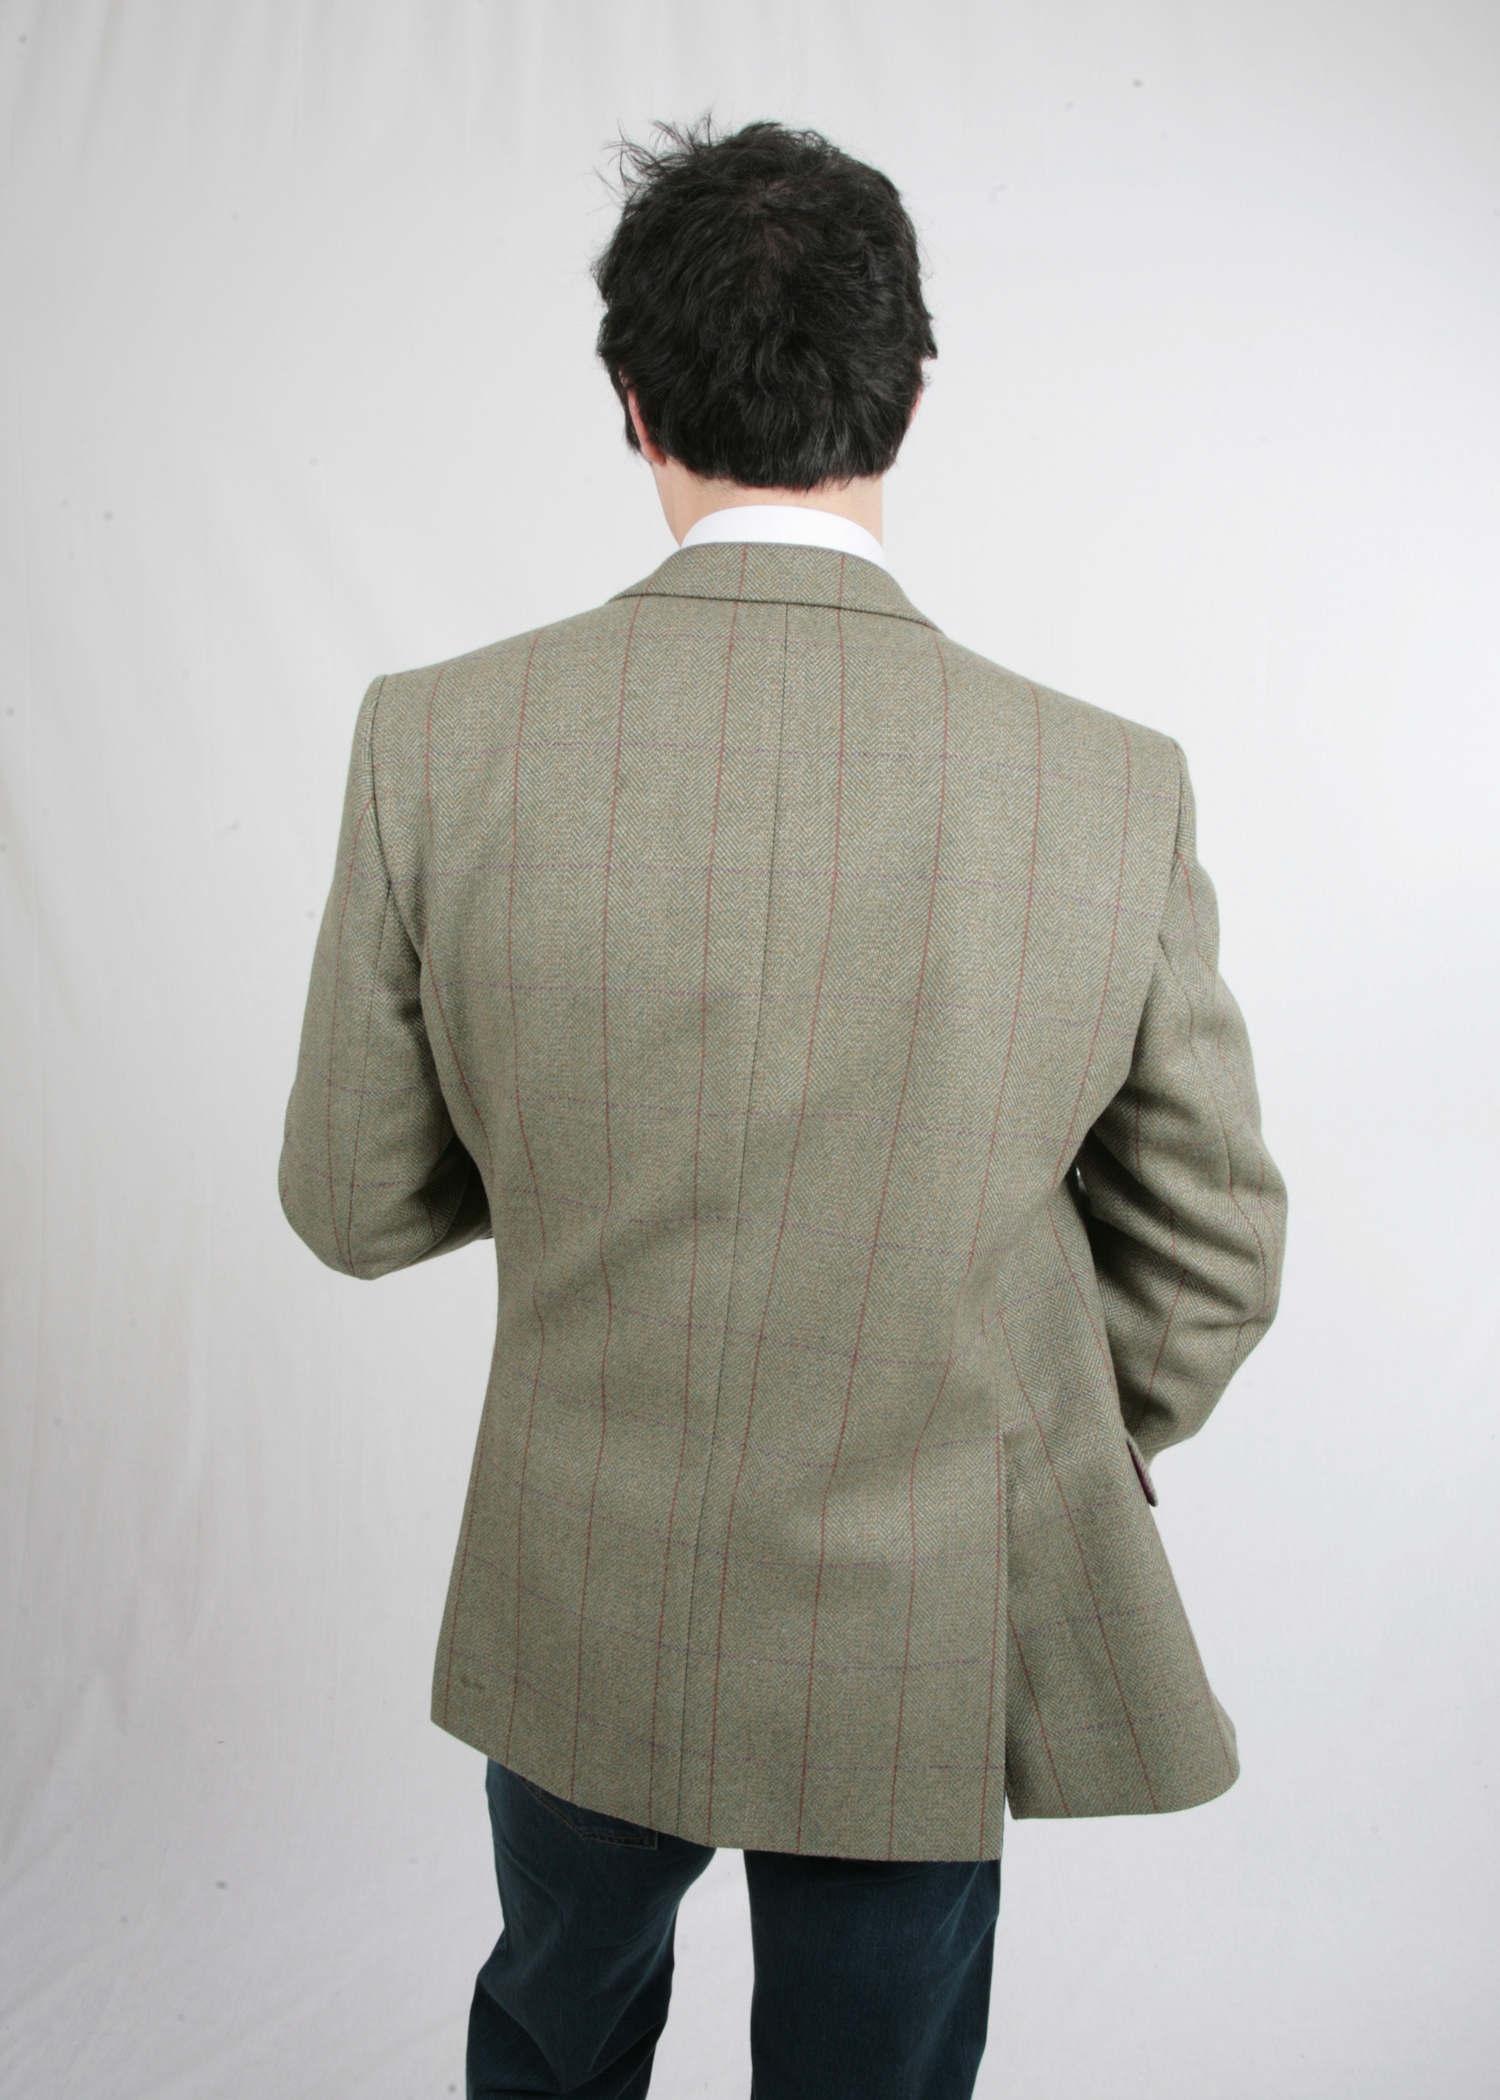 Moss Green with Box pattern